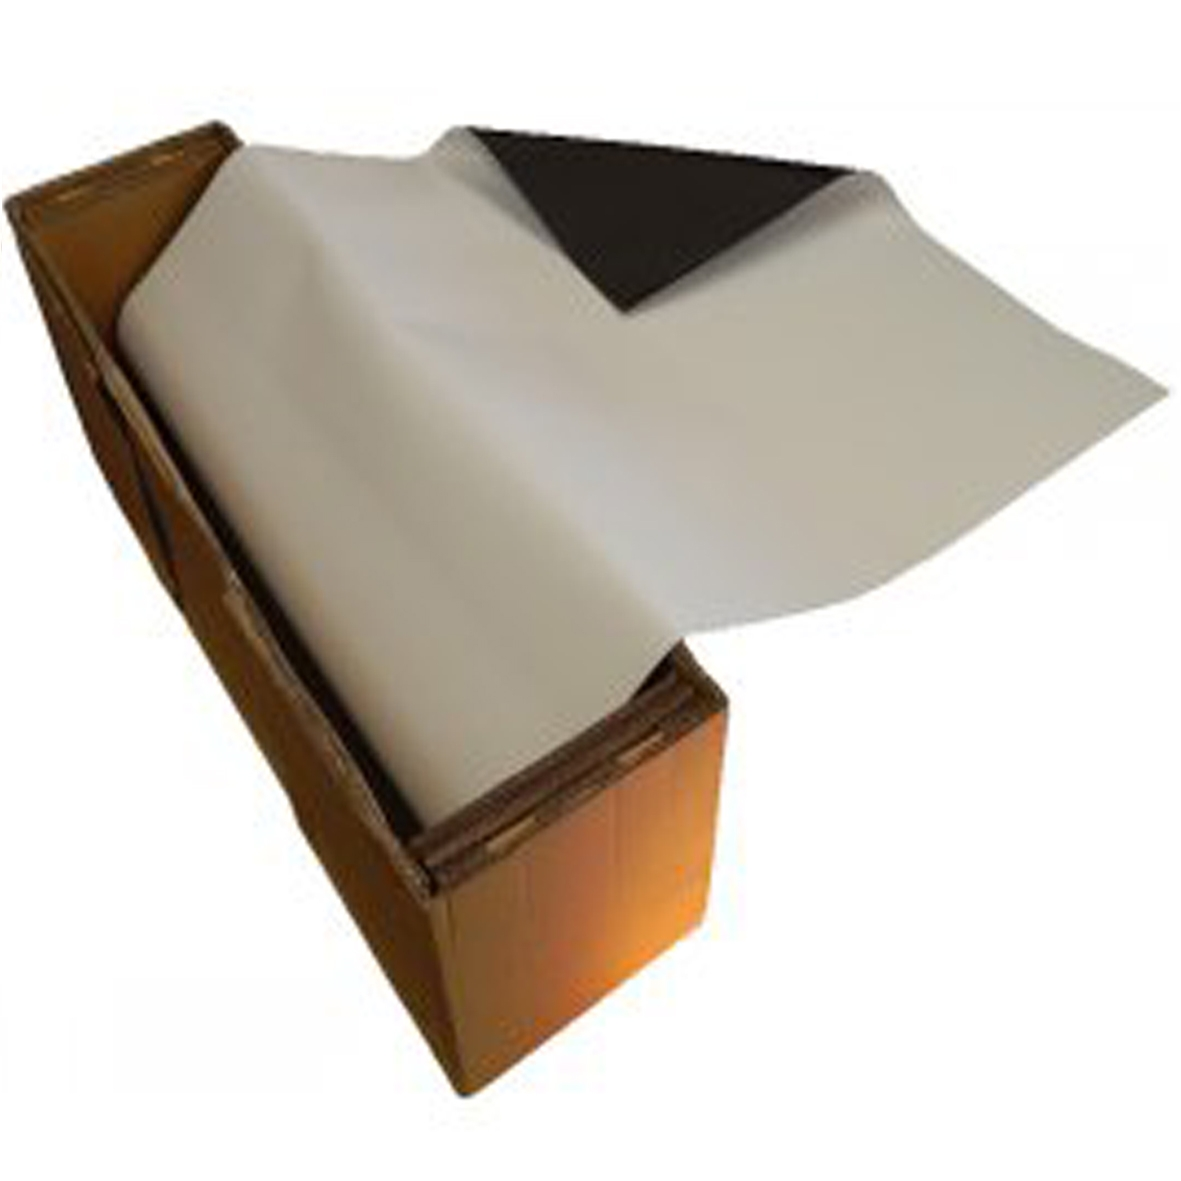 rouleau magn tique pas cher 123 magnet. Black Bedroom Furniture Sets. Home Design Ideas